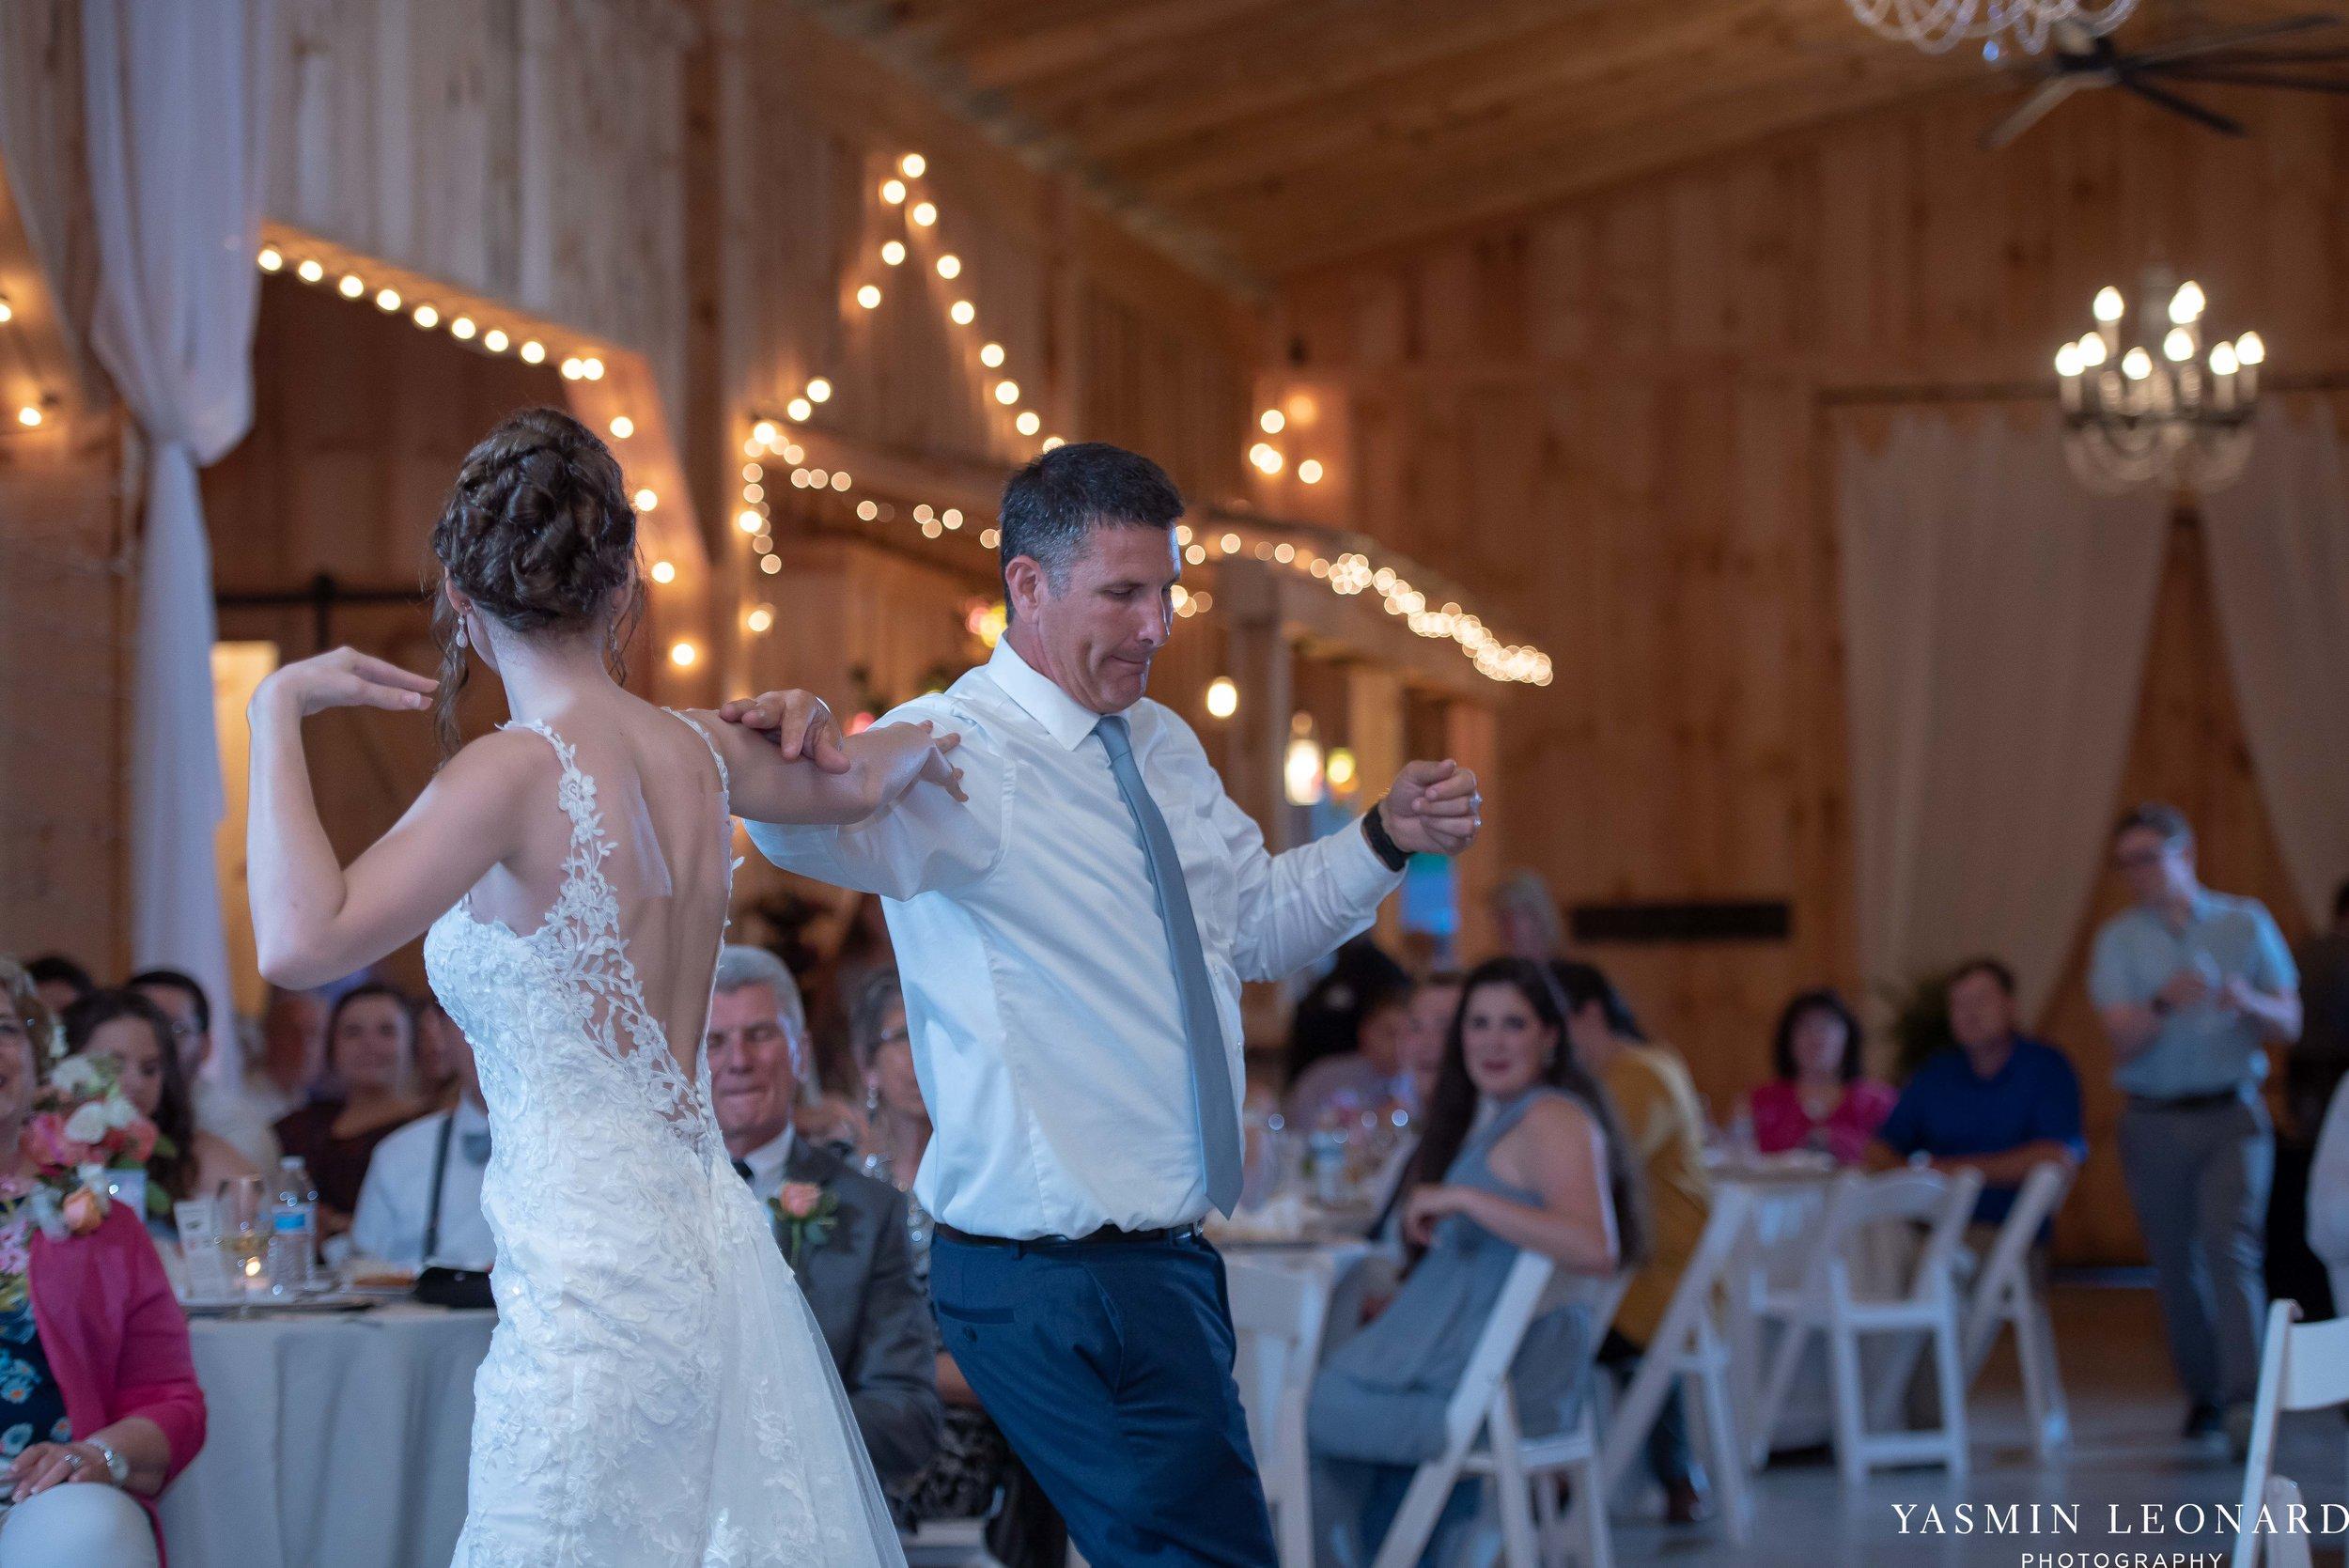 Old Homeplace Vineyard - NC Weddings - Outdoor Summer Weddings - Peony Boutique - Vineyard Wedding - NC Photographer - Yasmin Leonard Photography-69.jpg